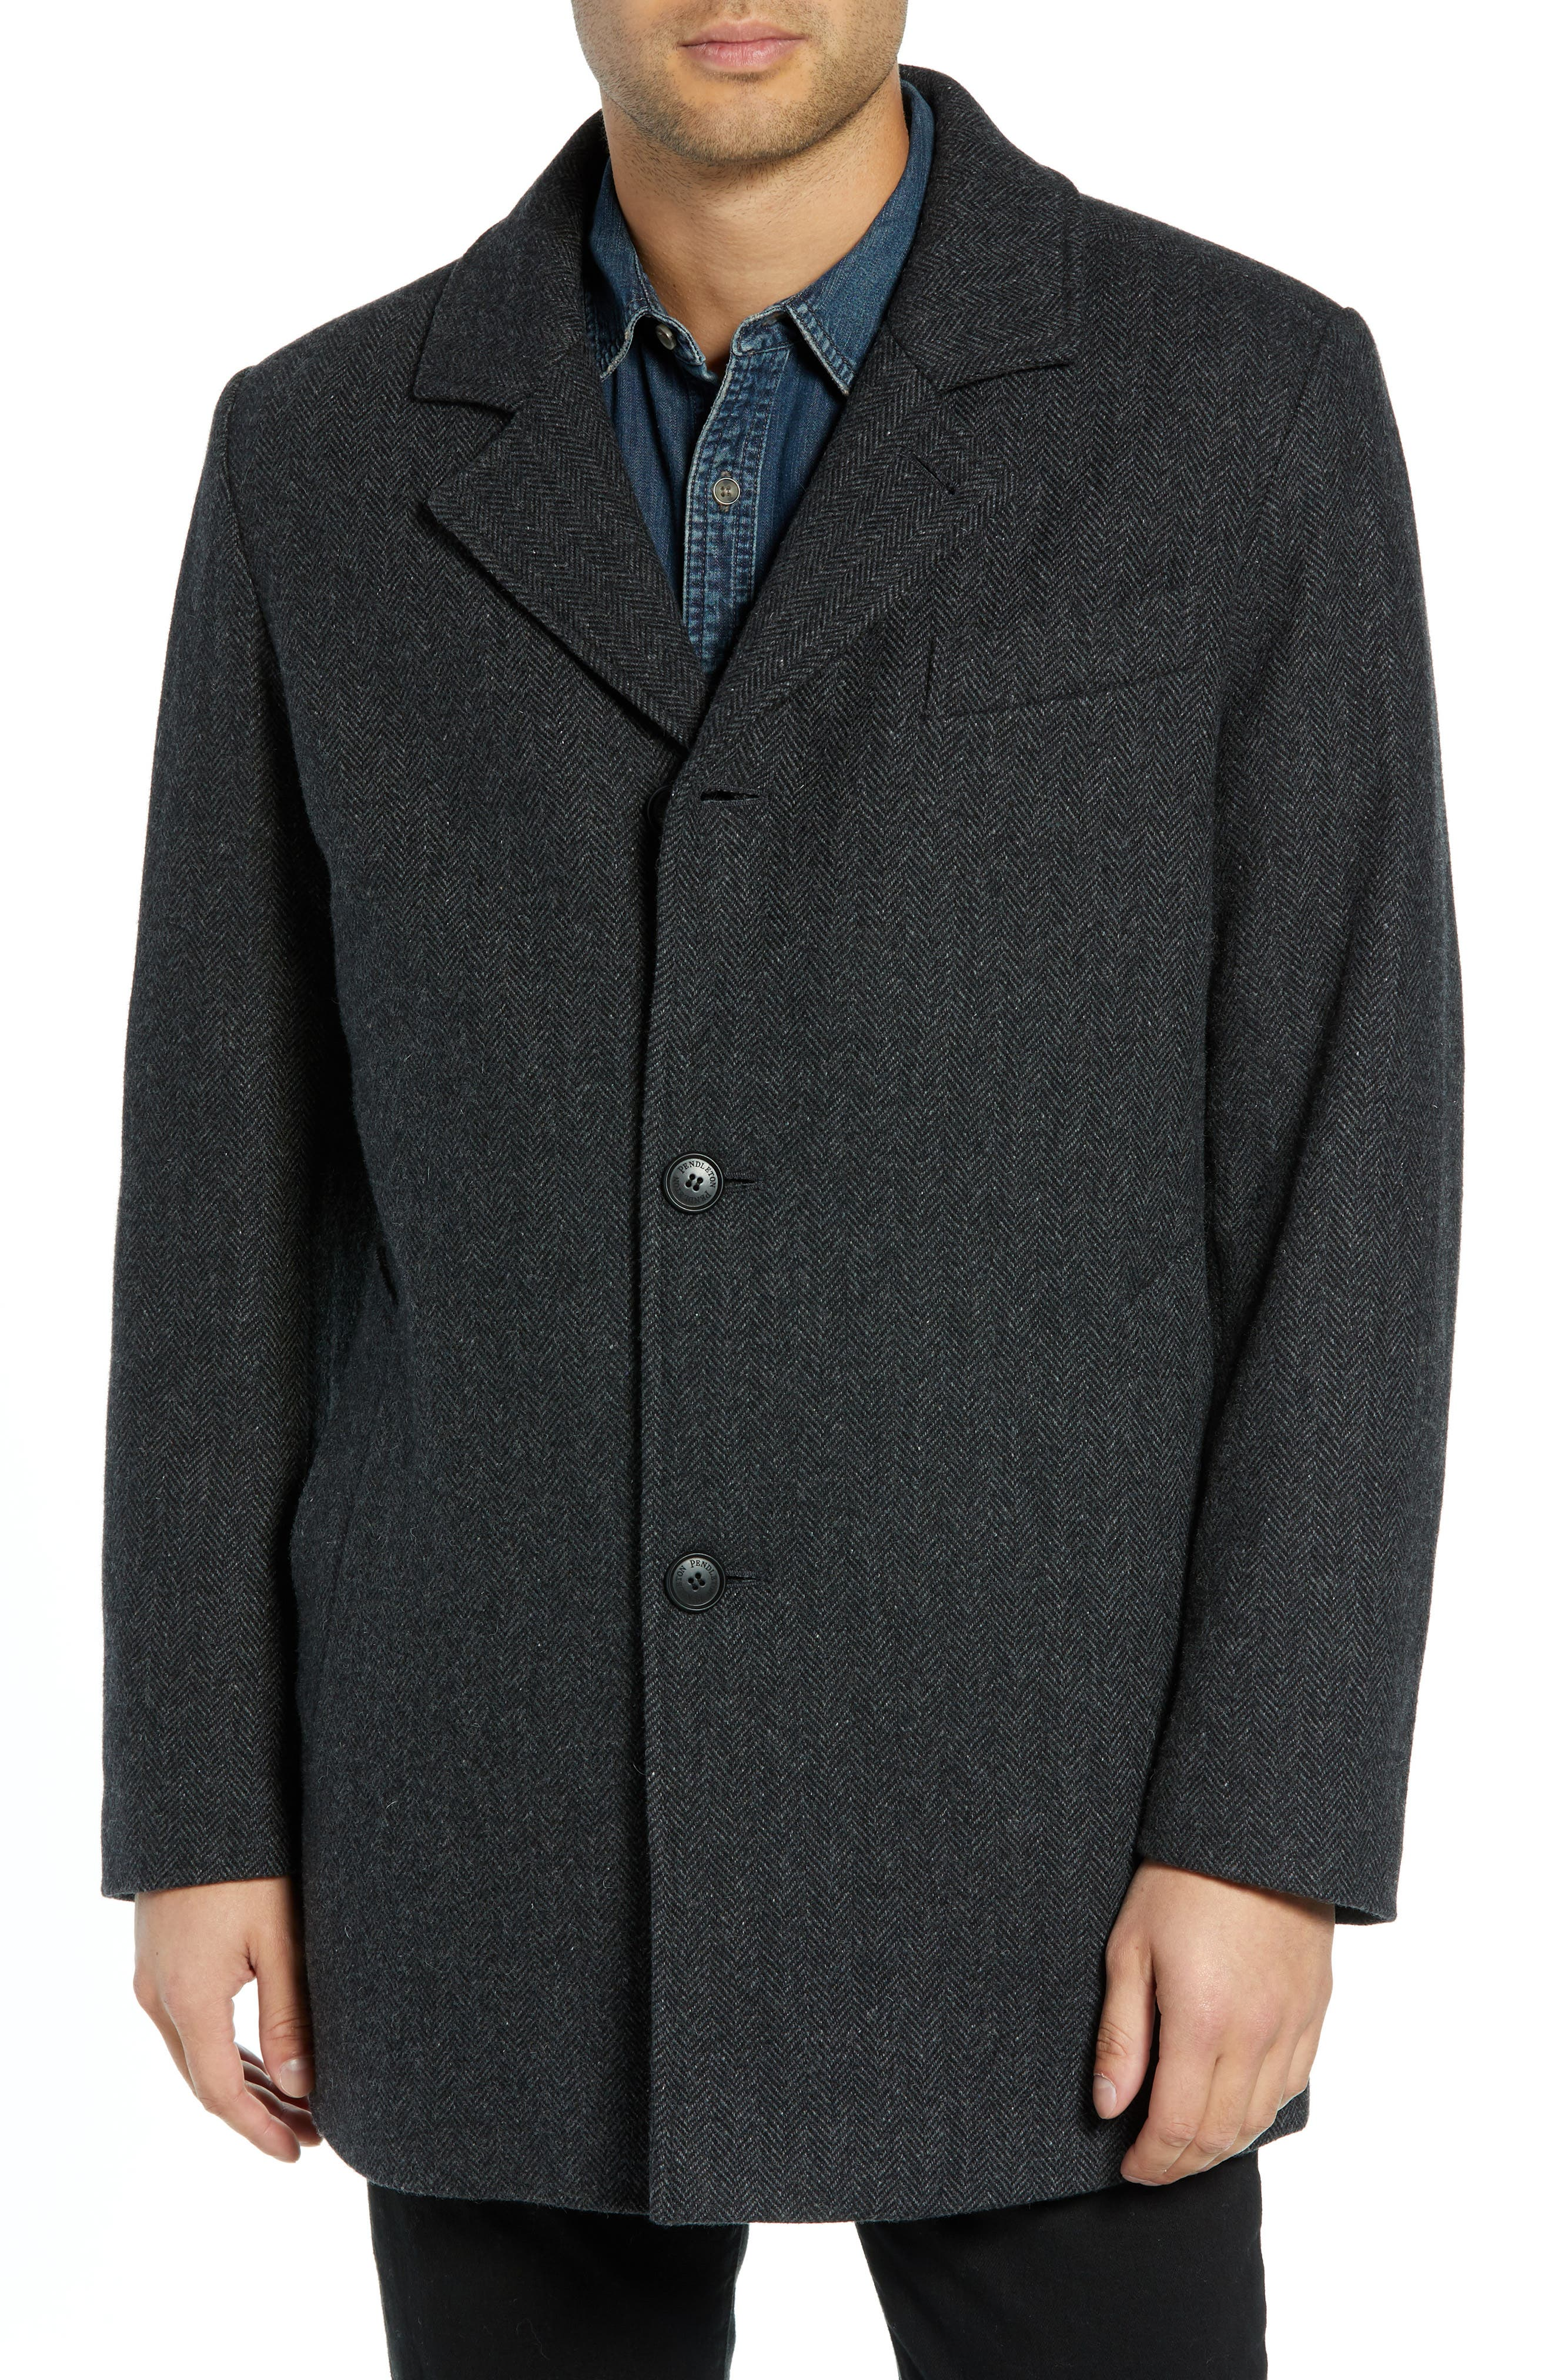 PENDLETON, Iconic Textures Manhattan Wool Blend Top Coat, Alternate thumbnail 5, color, CHARCOAL HERRINGBONE